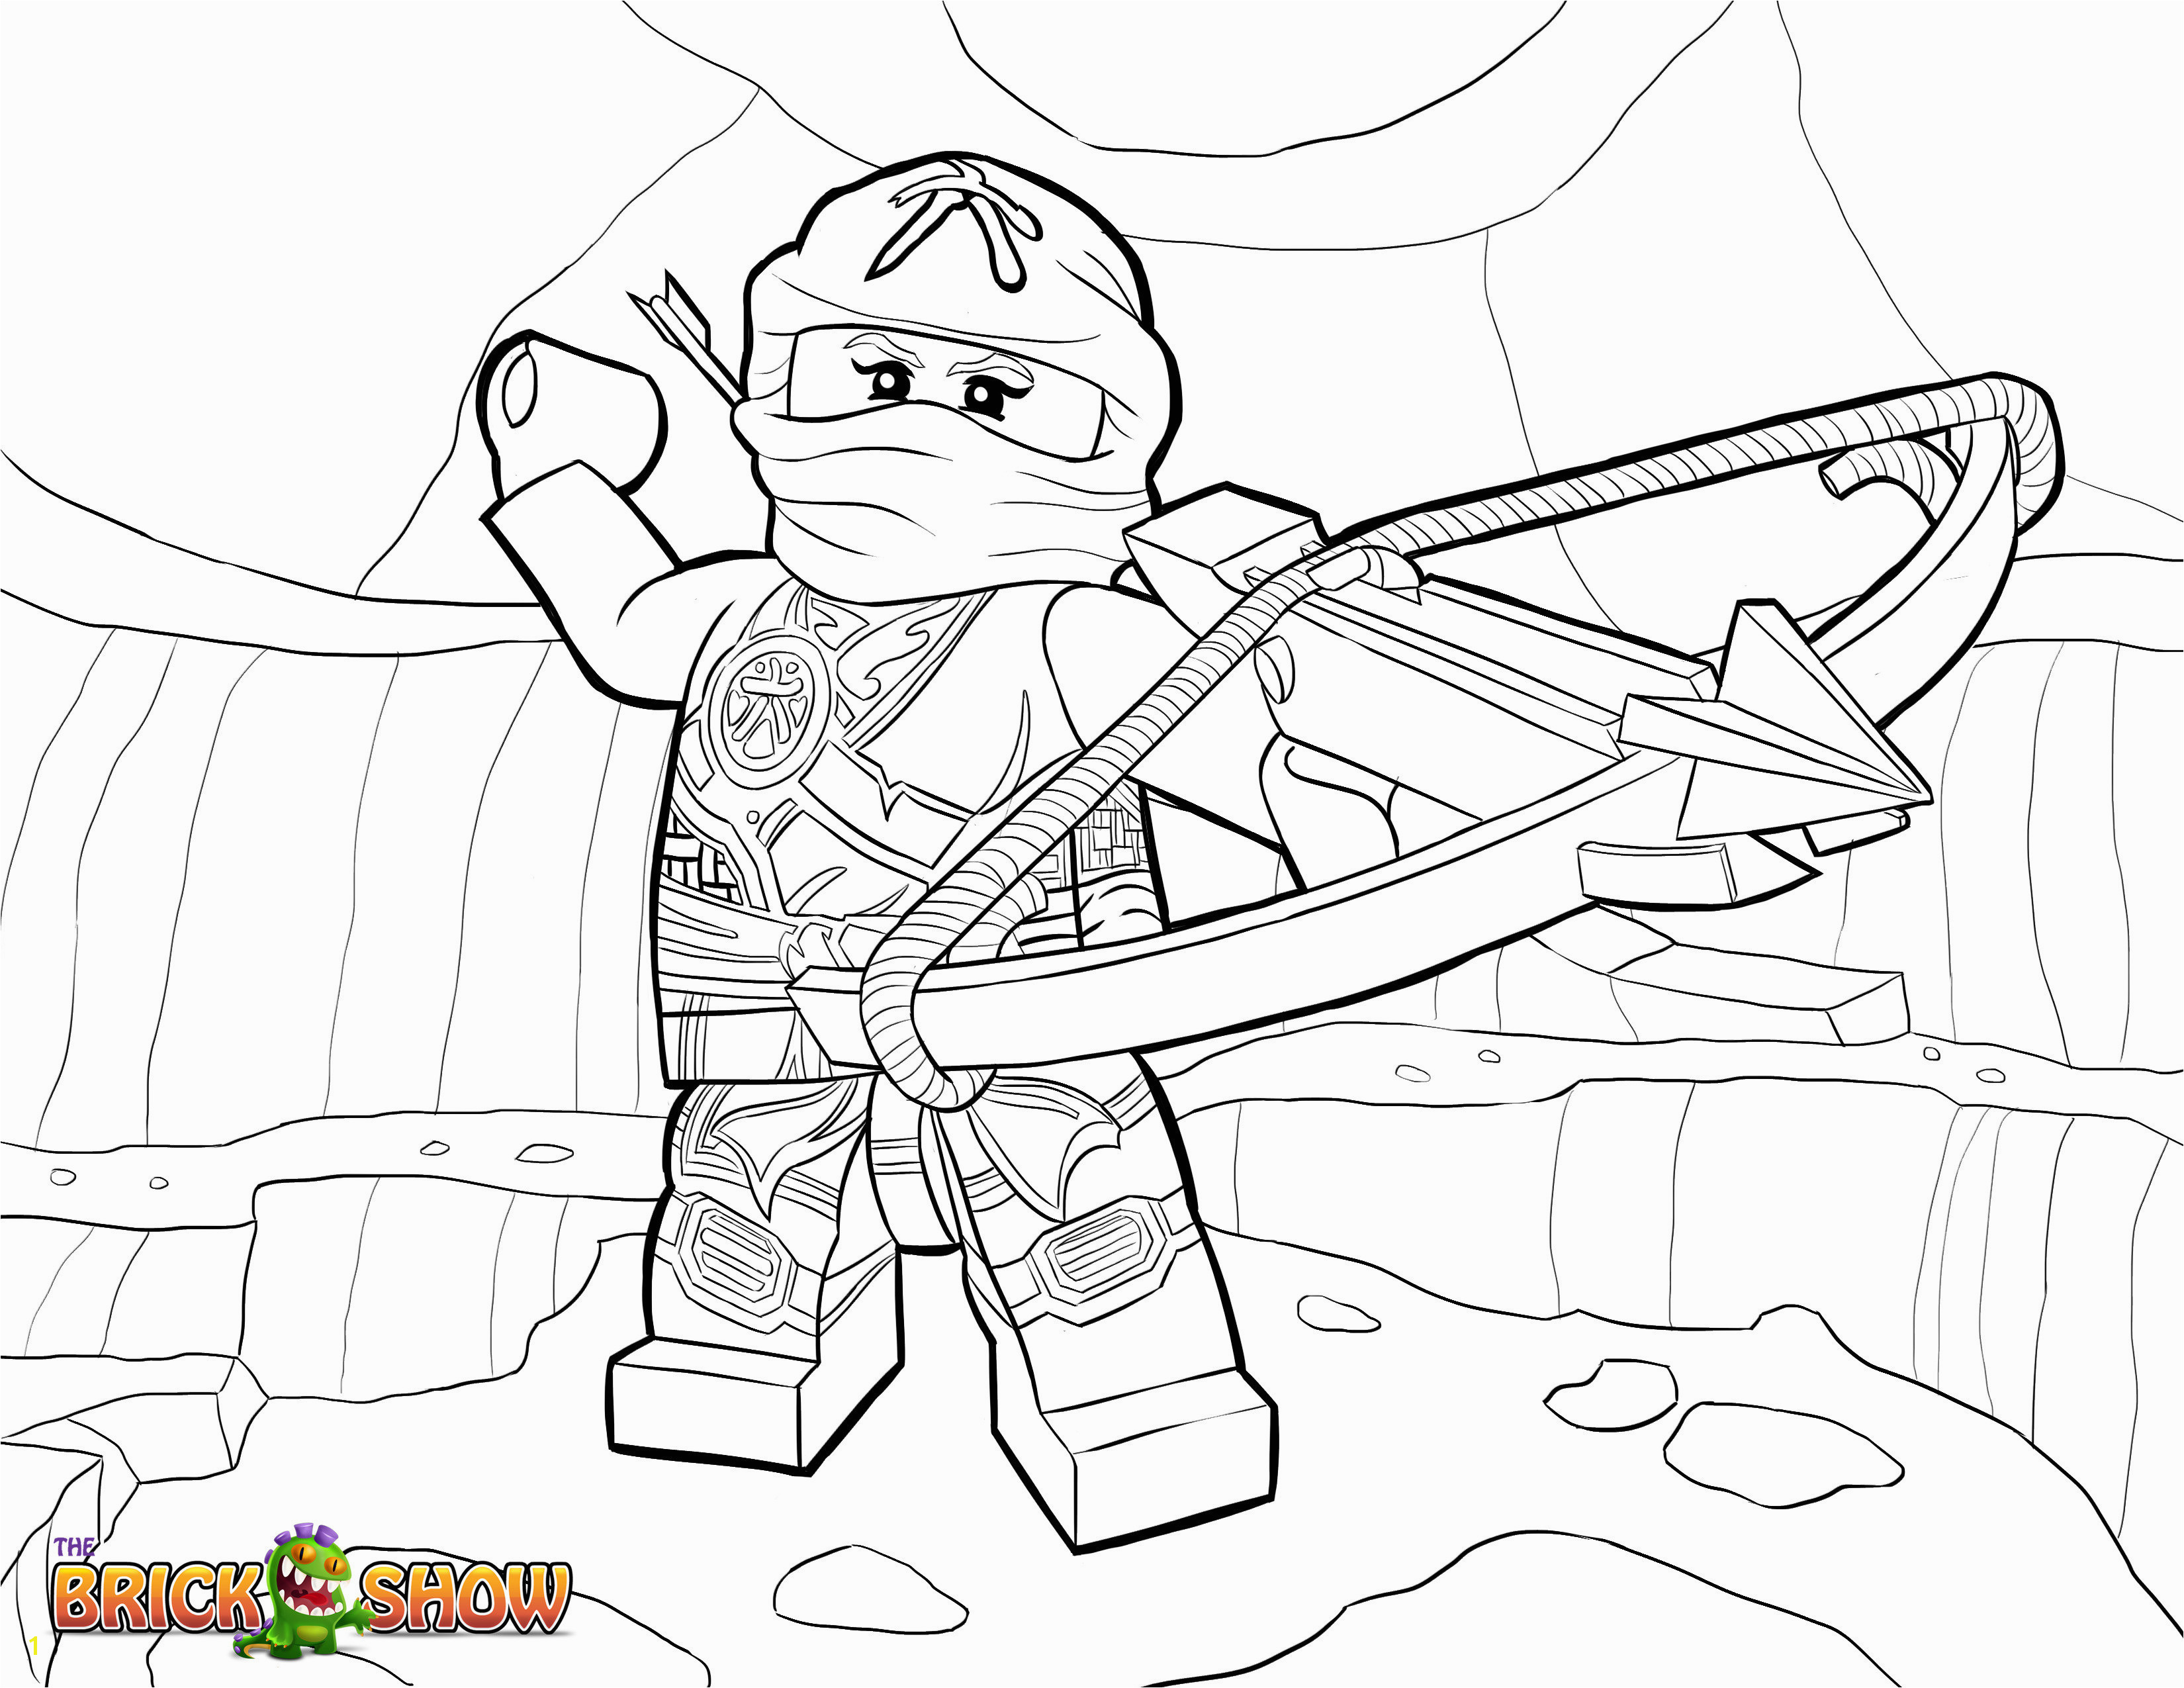 Lego City Polizei Ausmalbilder Genial Malvorlagen Lego Ninjago Schön Lego Ninjago Coloring Pages Wonderful